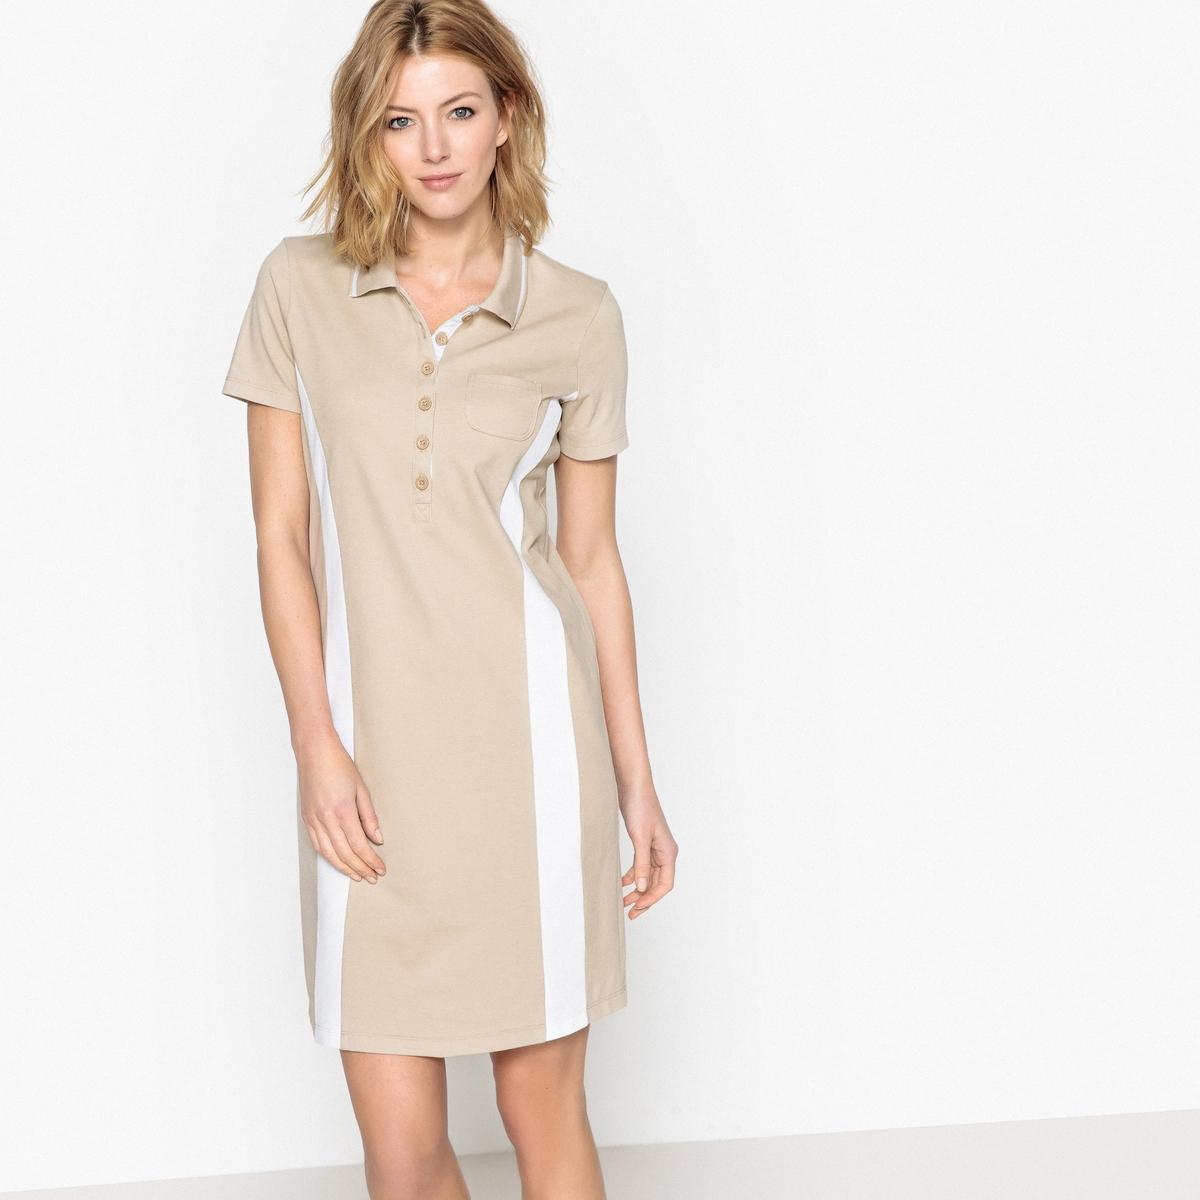 Платье ANNE WEYBURN 6115355 от LaRedoute